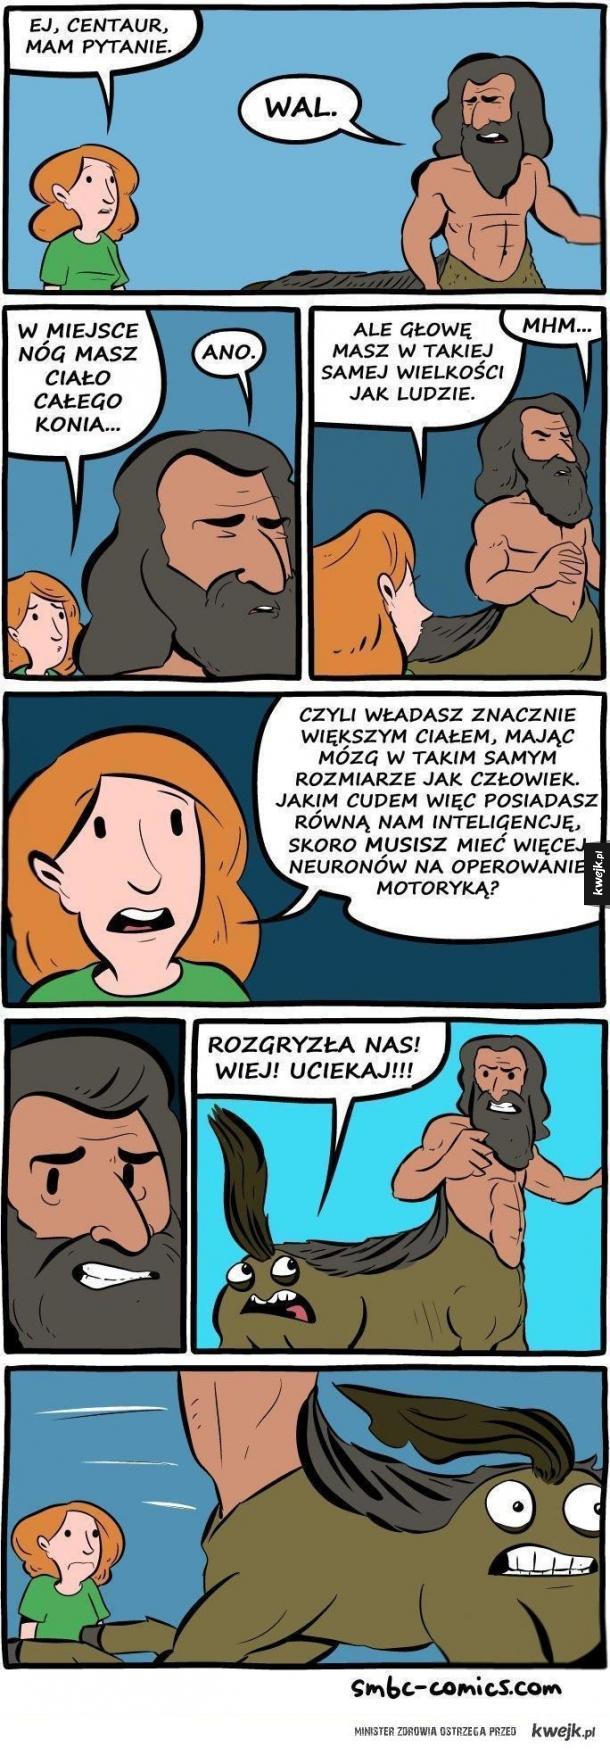 Sekret centaura